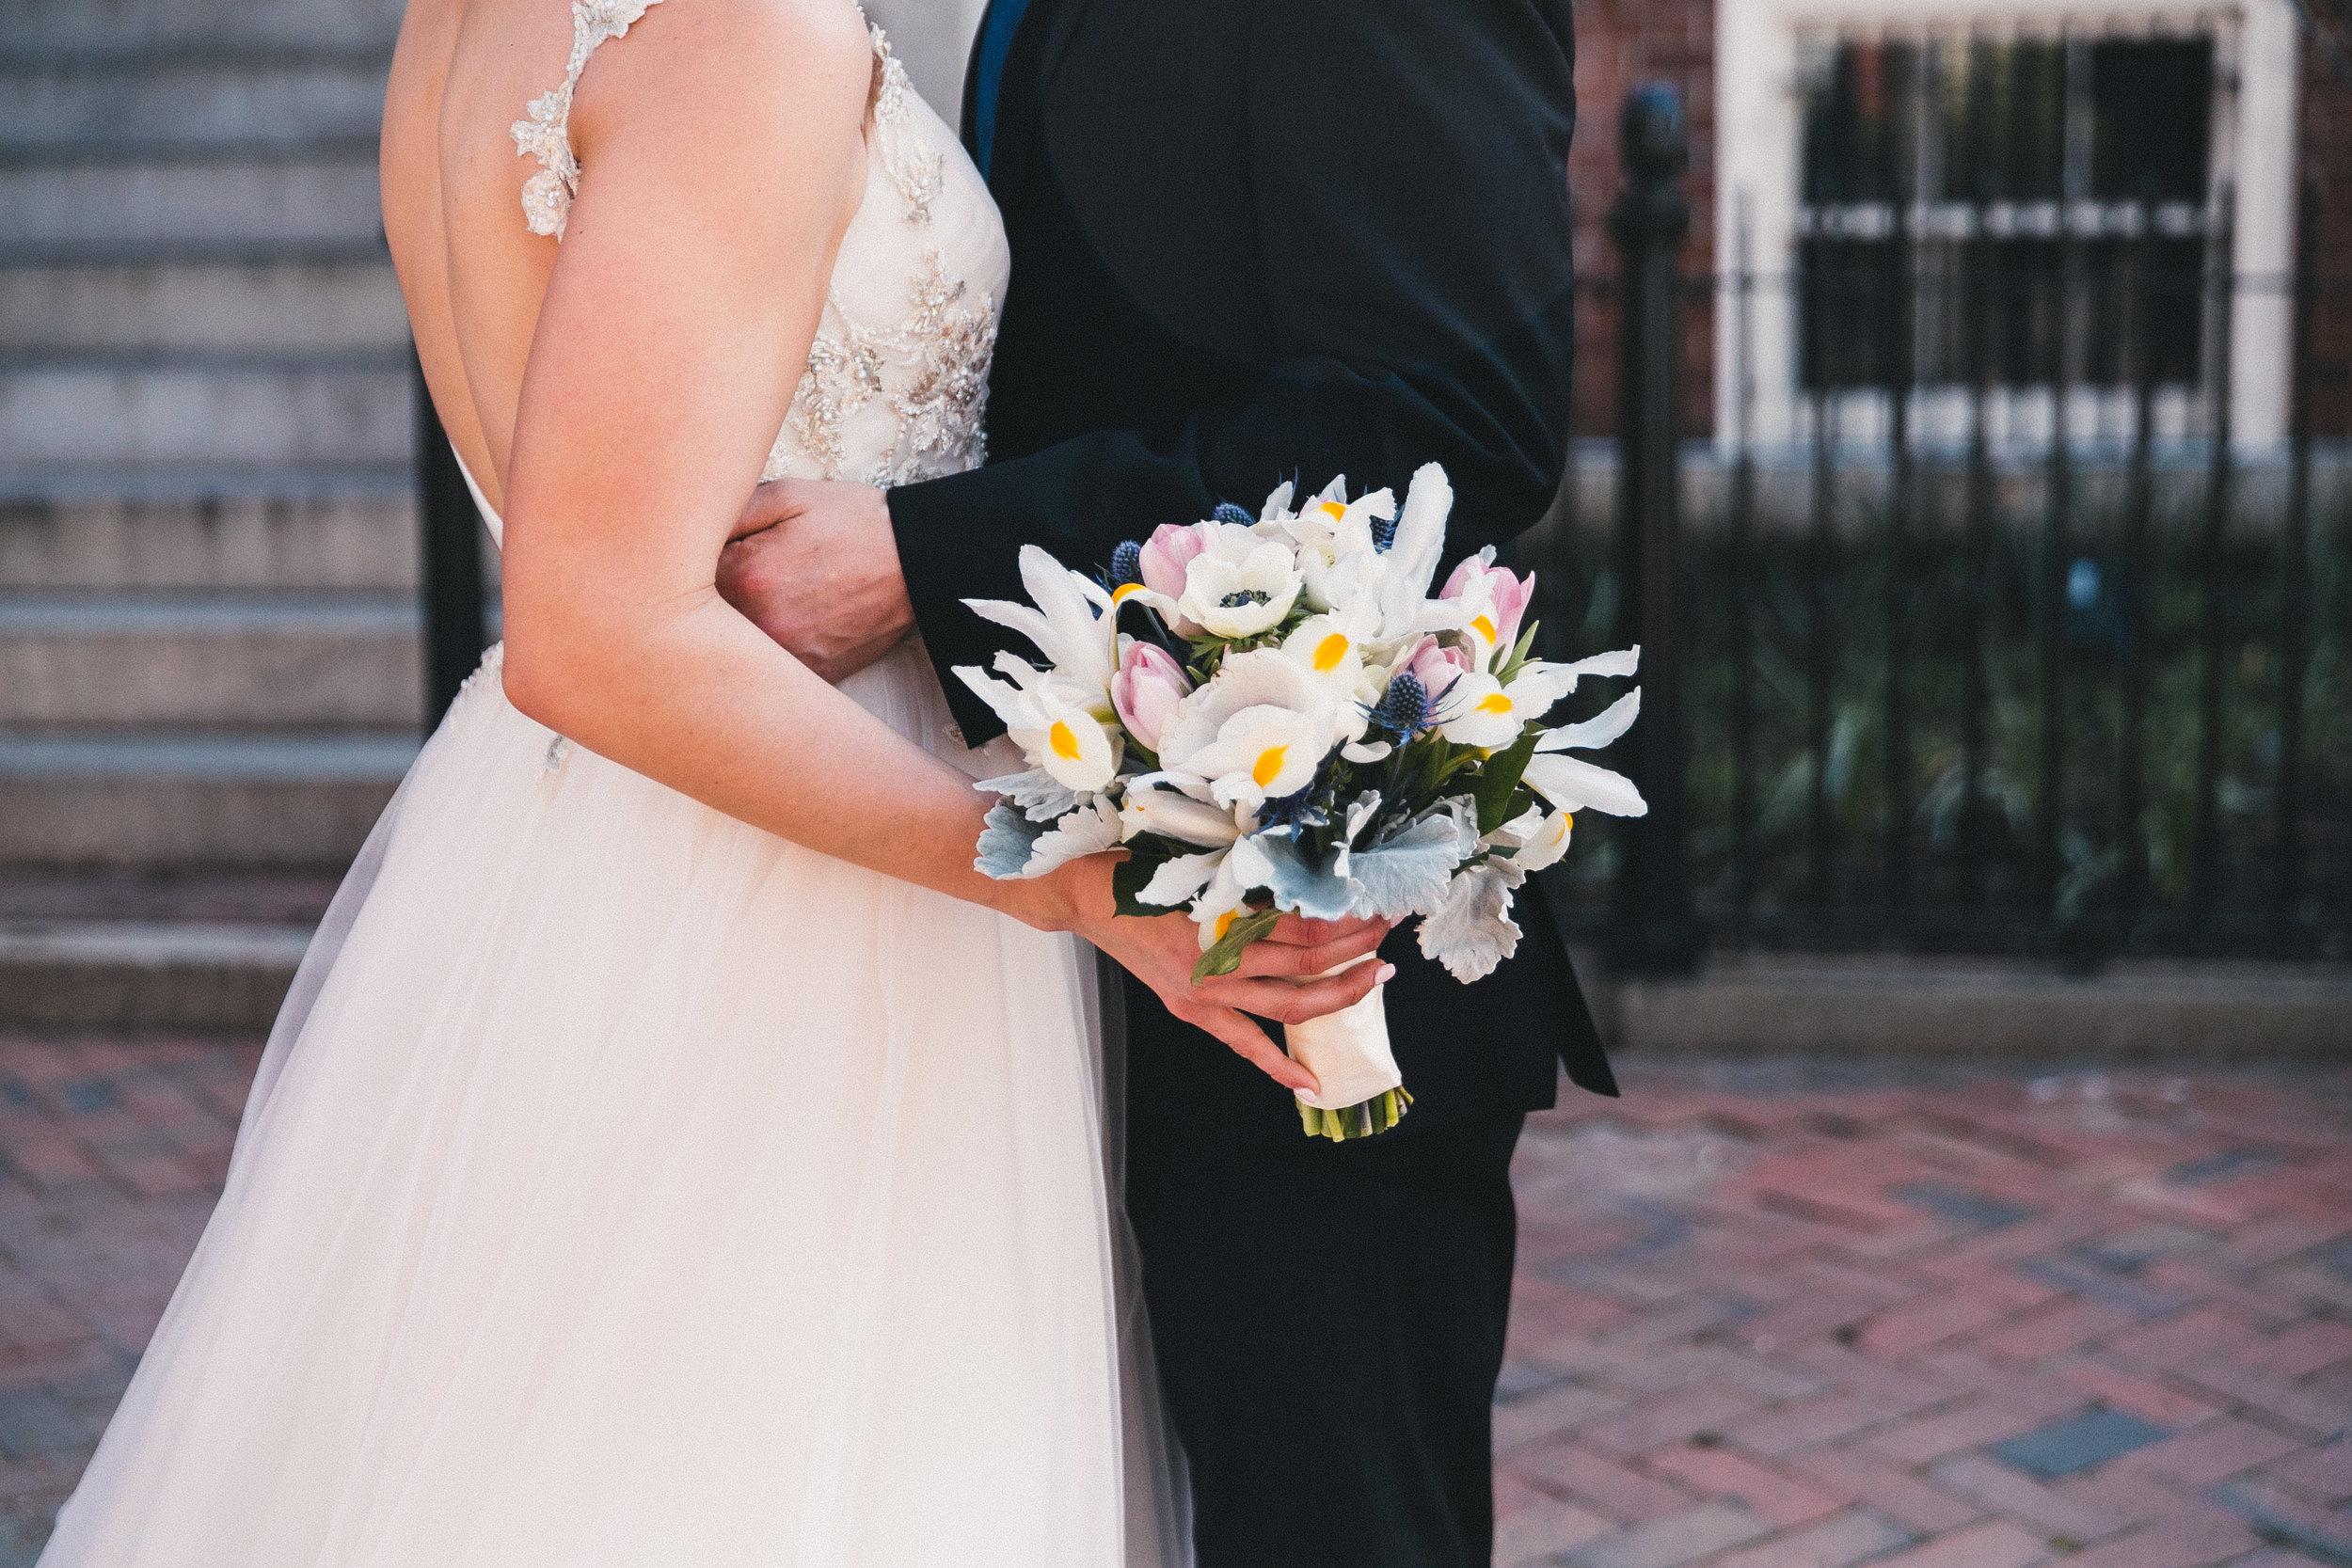 Lindsey & Bert - Wedding 4.1.17-337.jpg